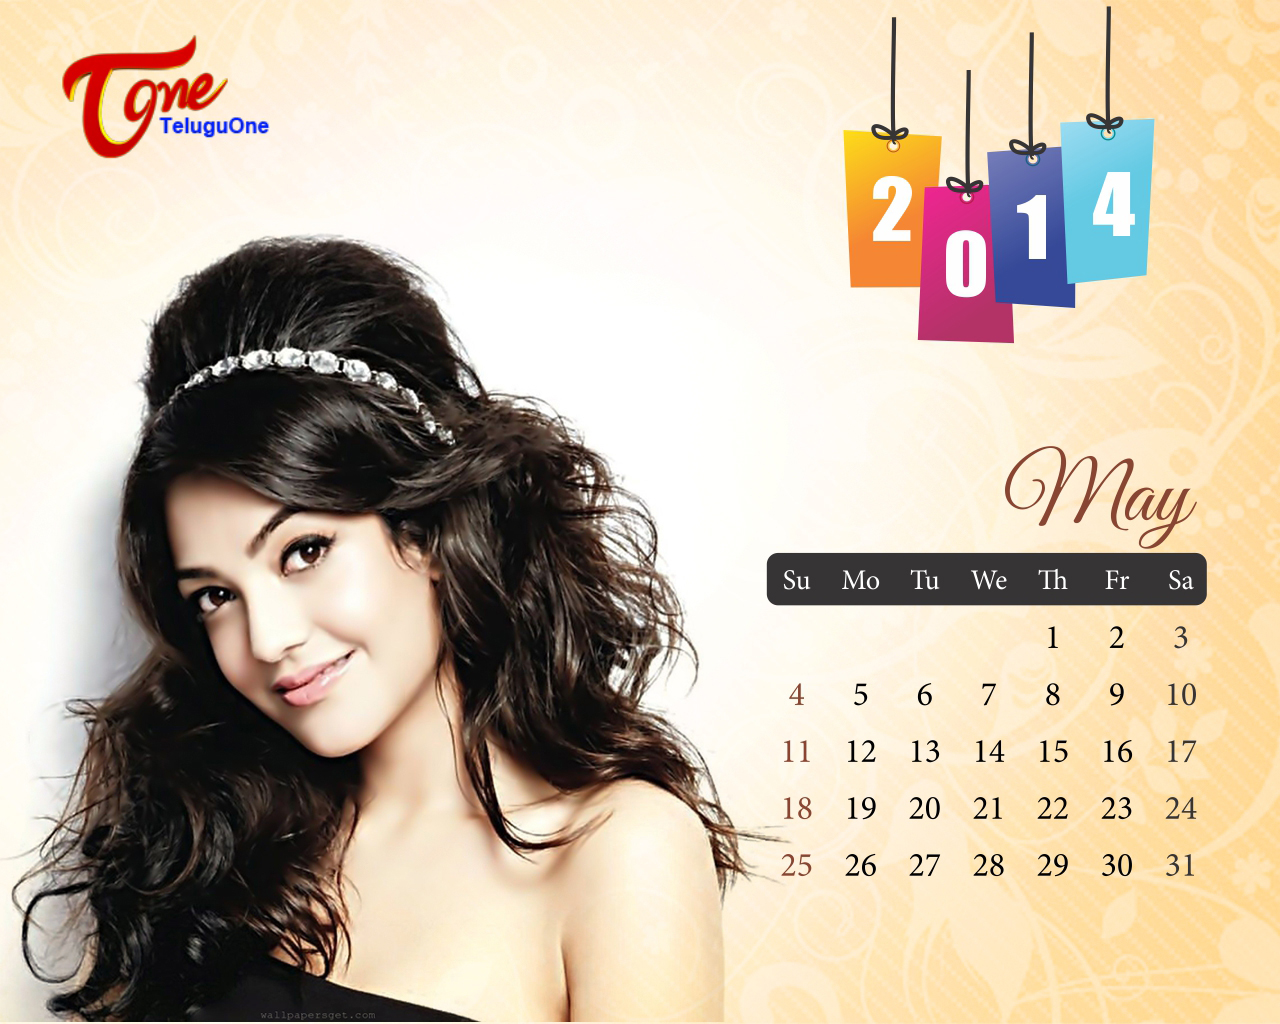 1280 x 1024 jpeg 761kB, Www new year grafity2015 new calendar template ...